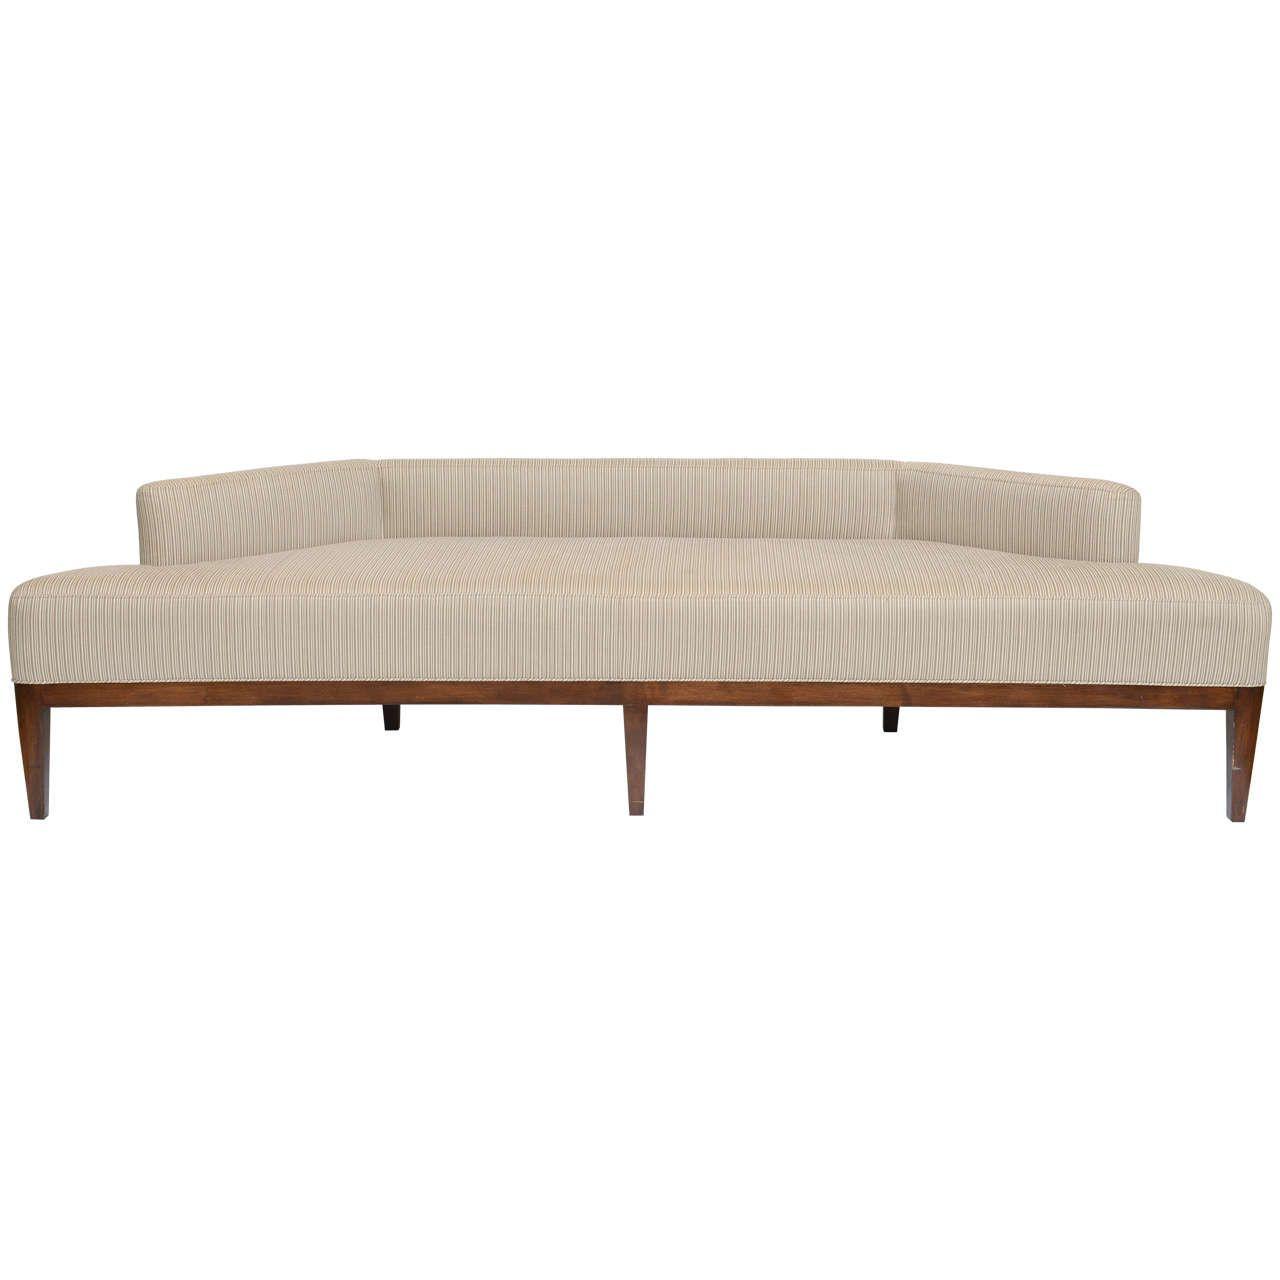 Exceptional Sleek Low Angular Sofa/Settee | SOFAS | Settee ...